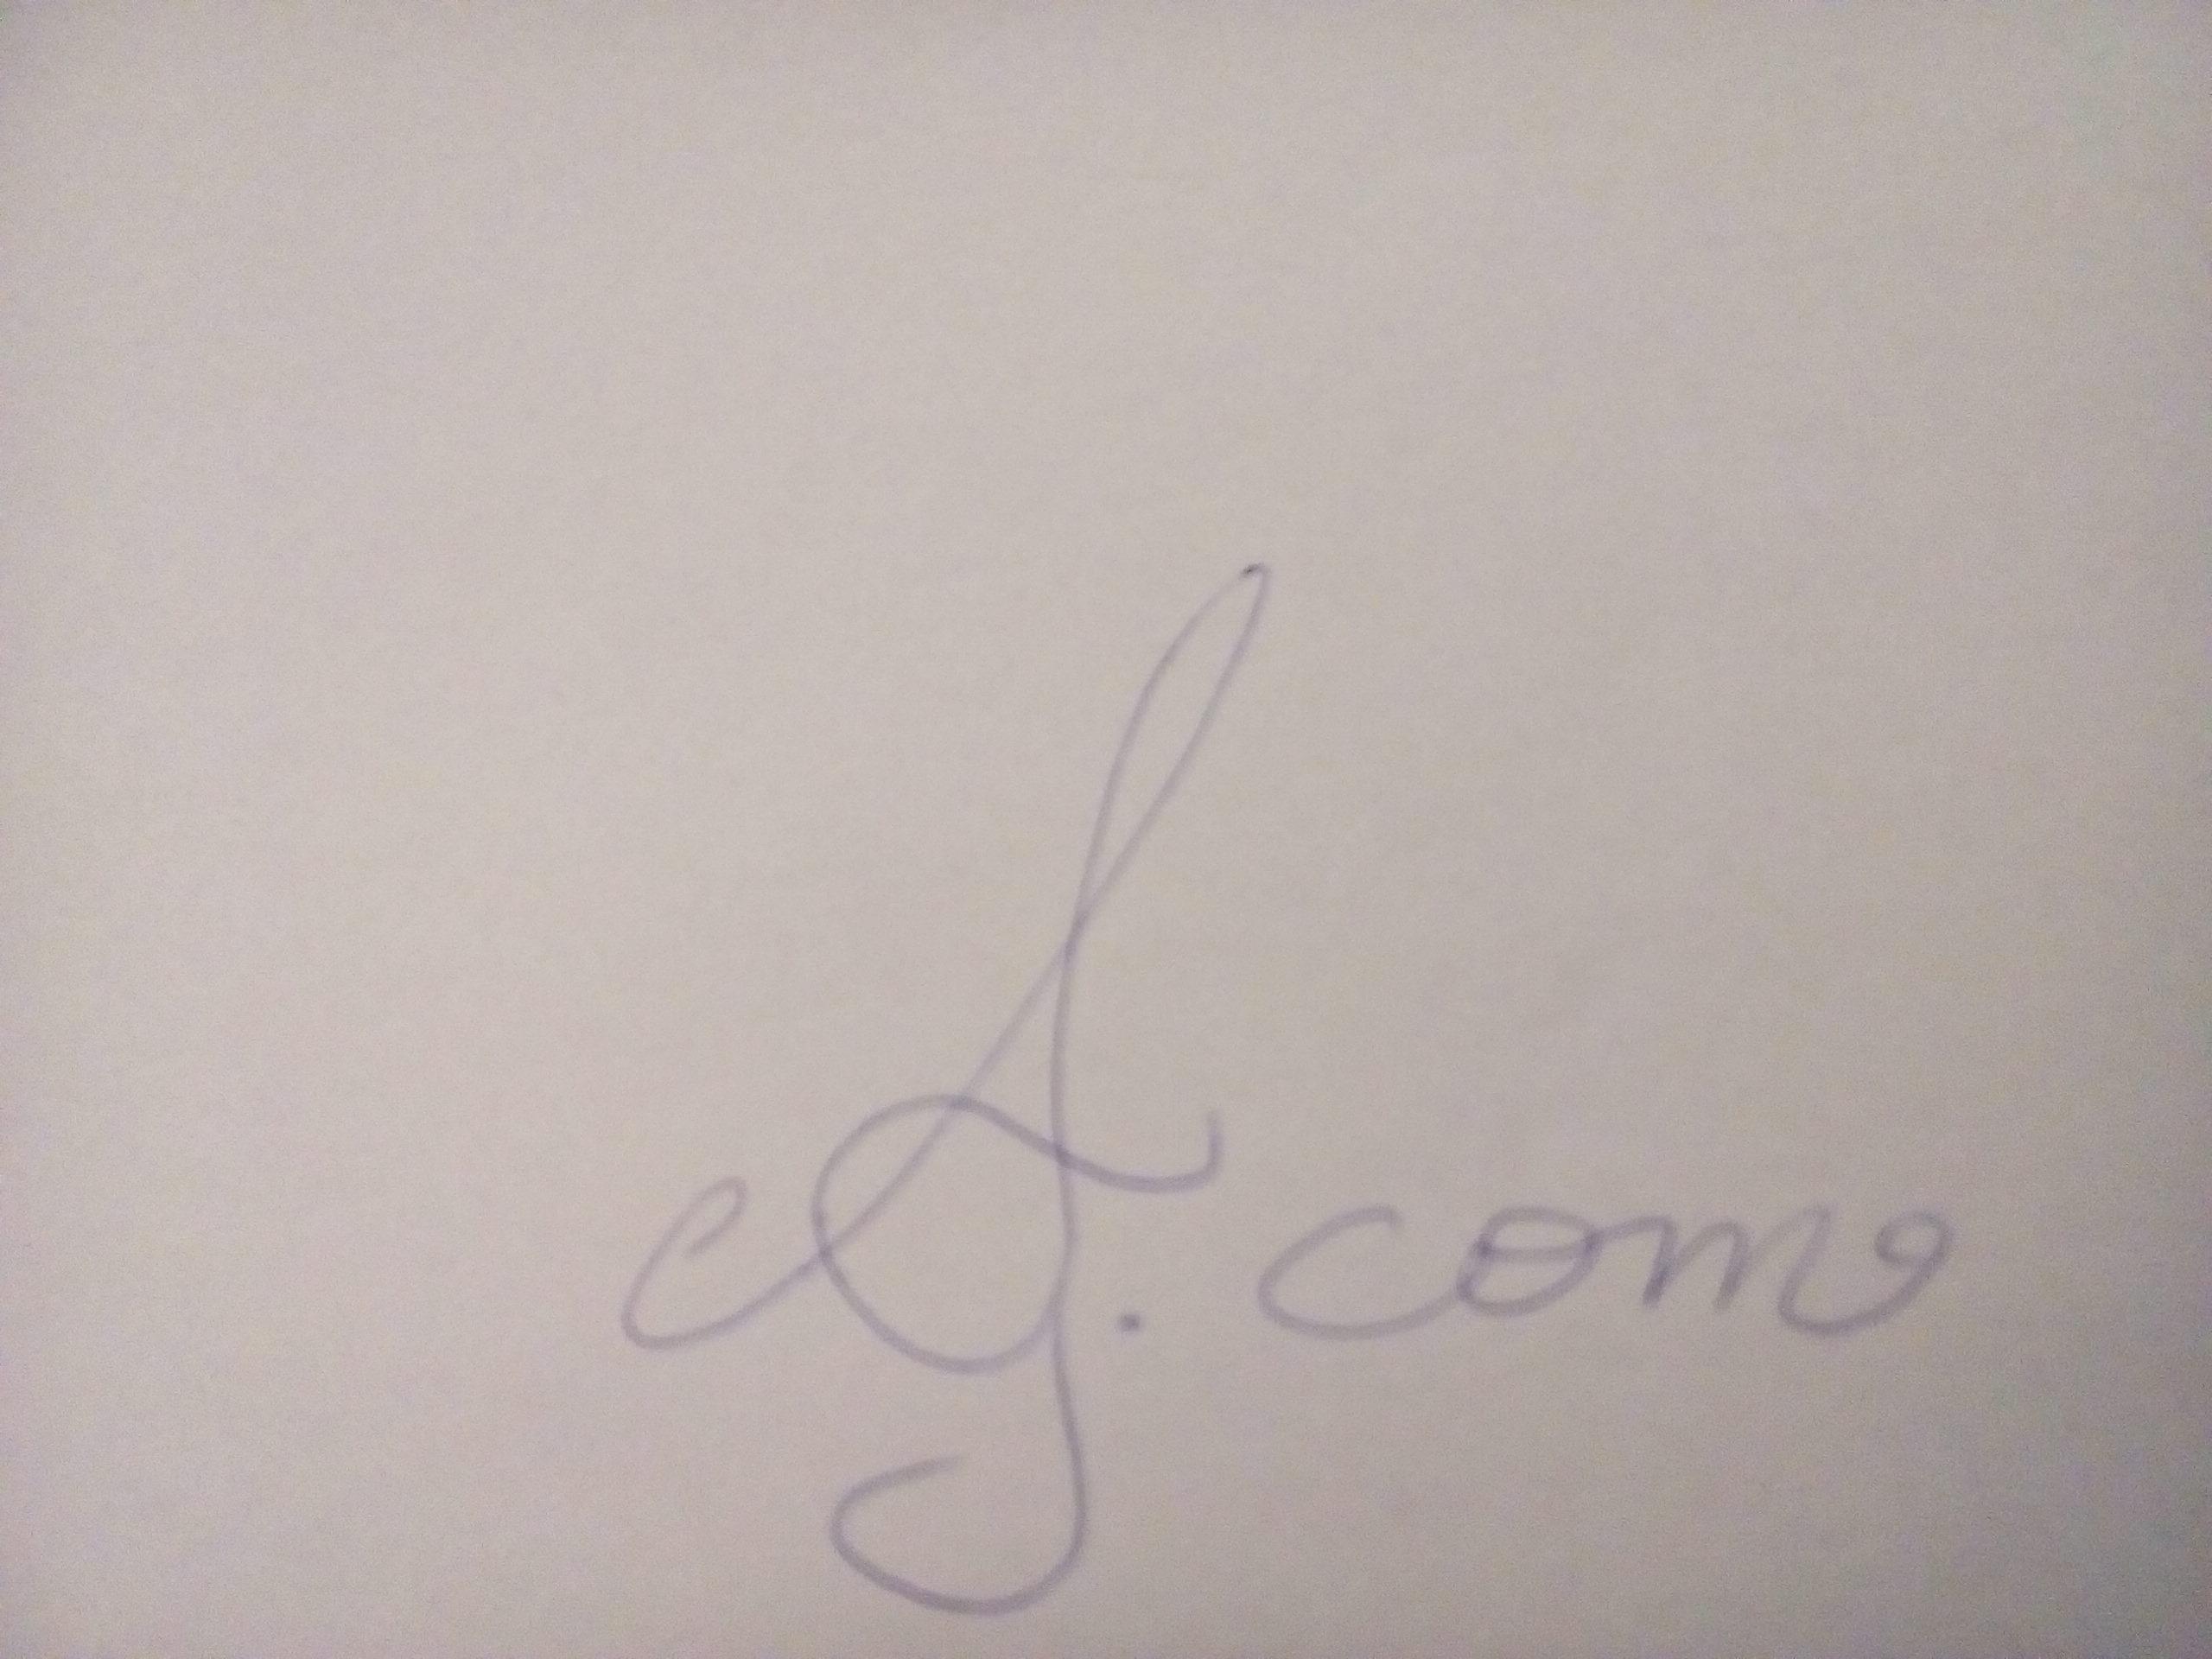 ANASTASIA GIANNOPOULOU Signature